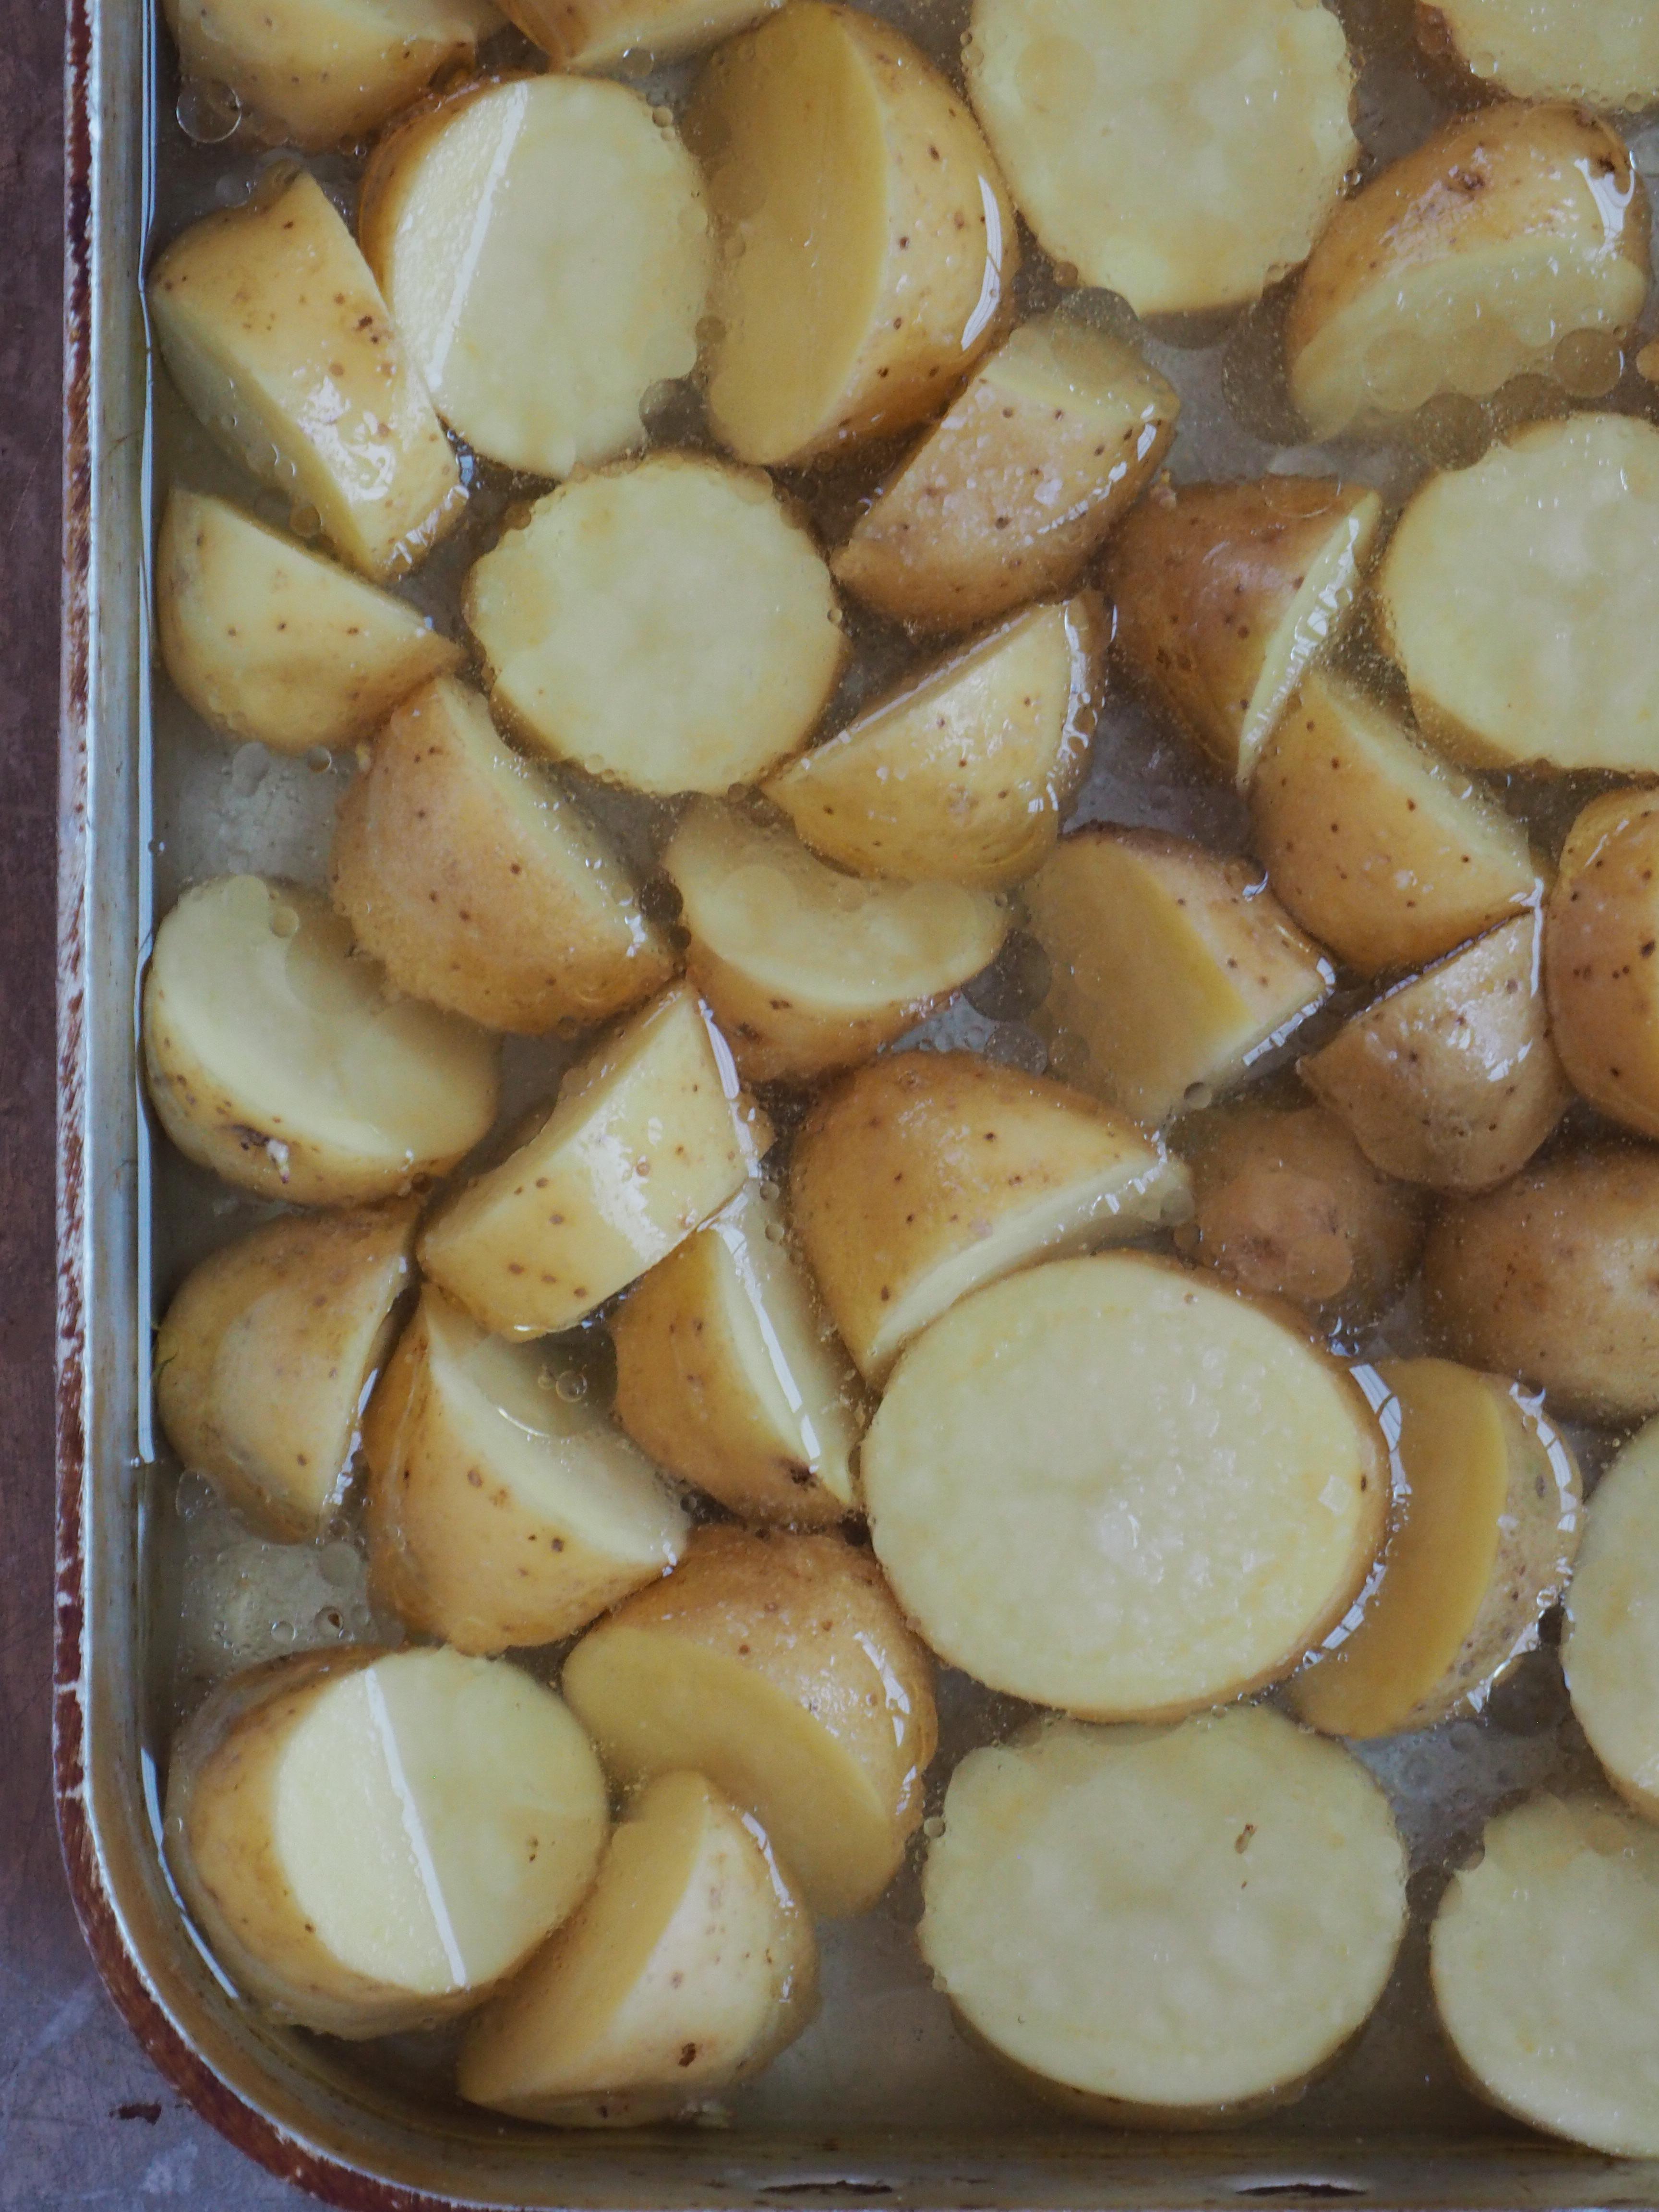 stekte poteter i ovn